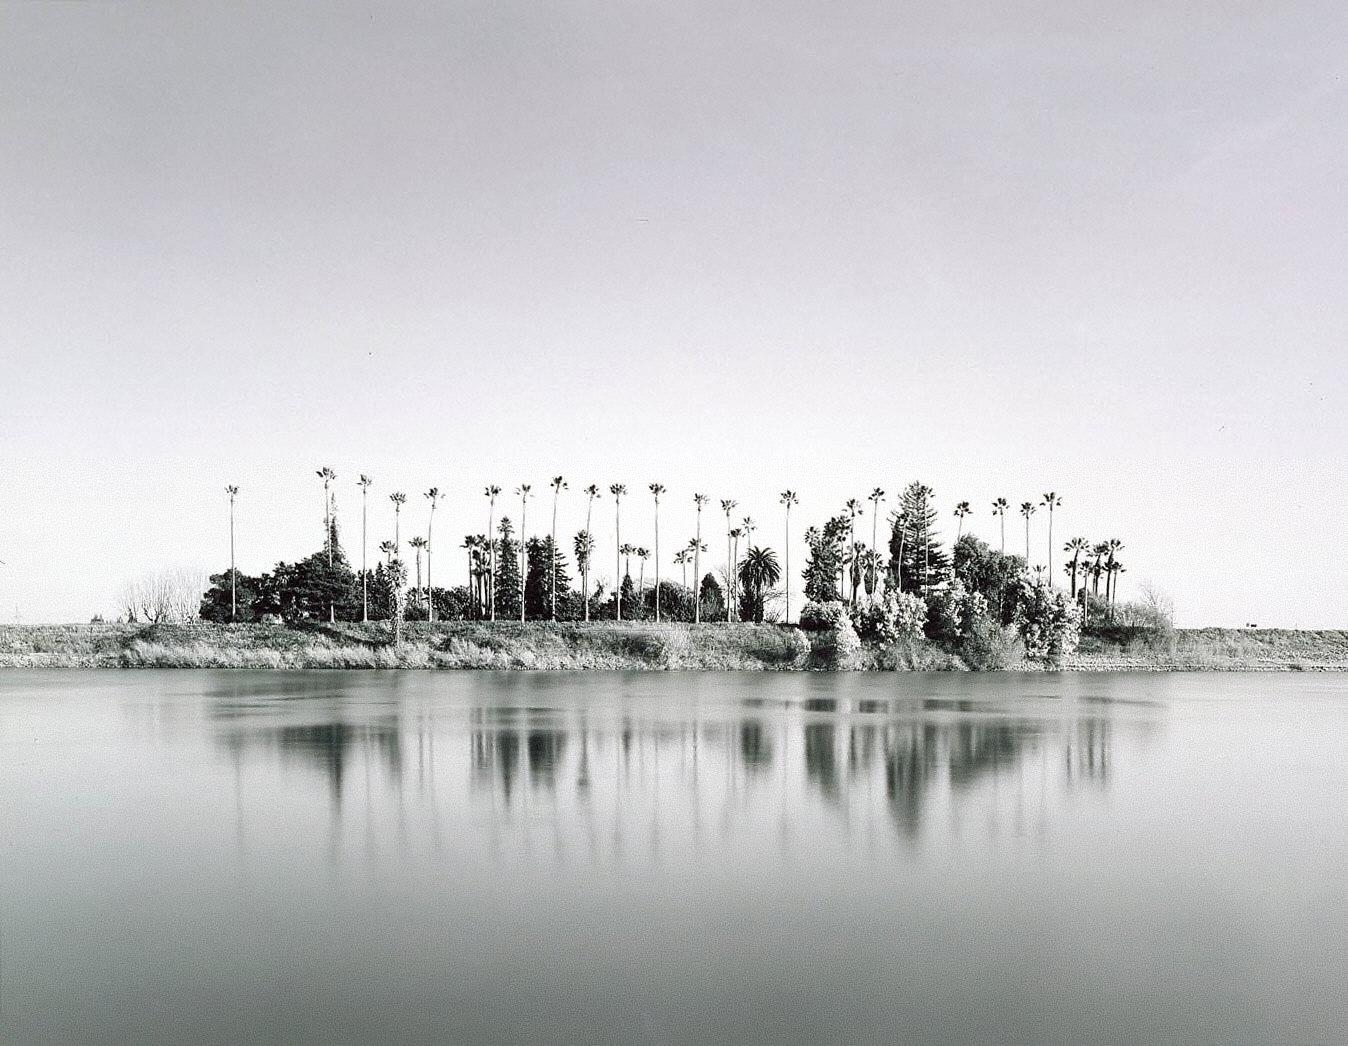 Delta Farm, Sacramento River, California, from the Great Central Valley Project